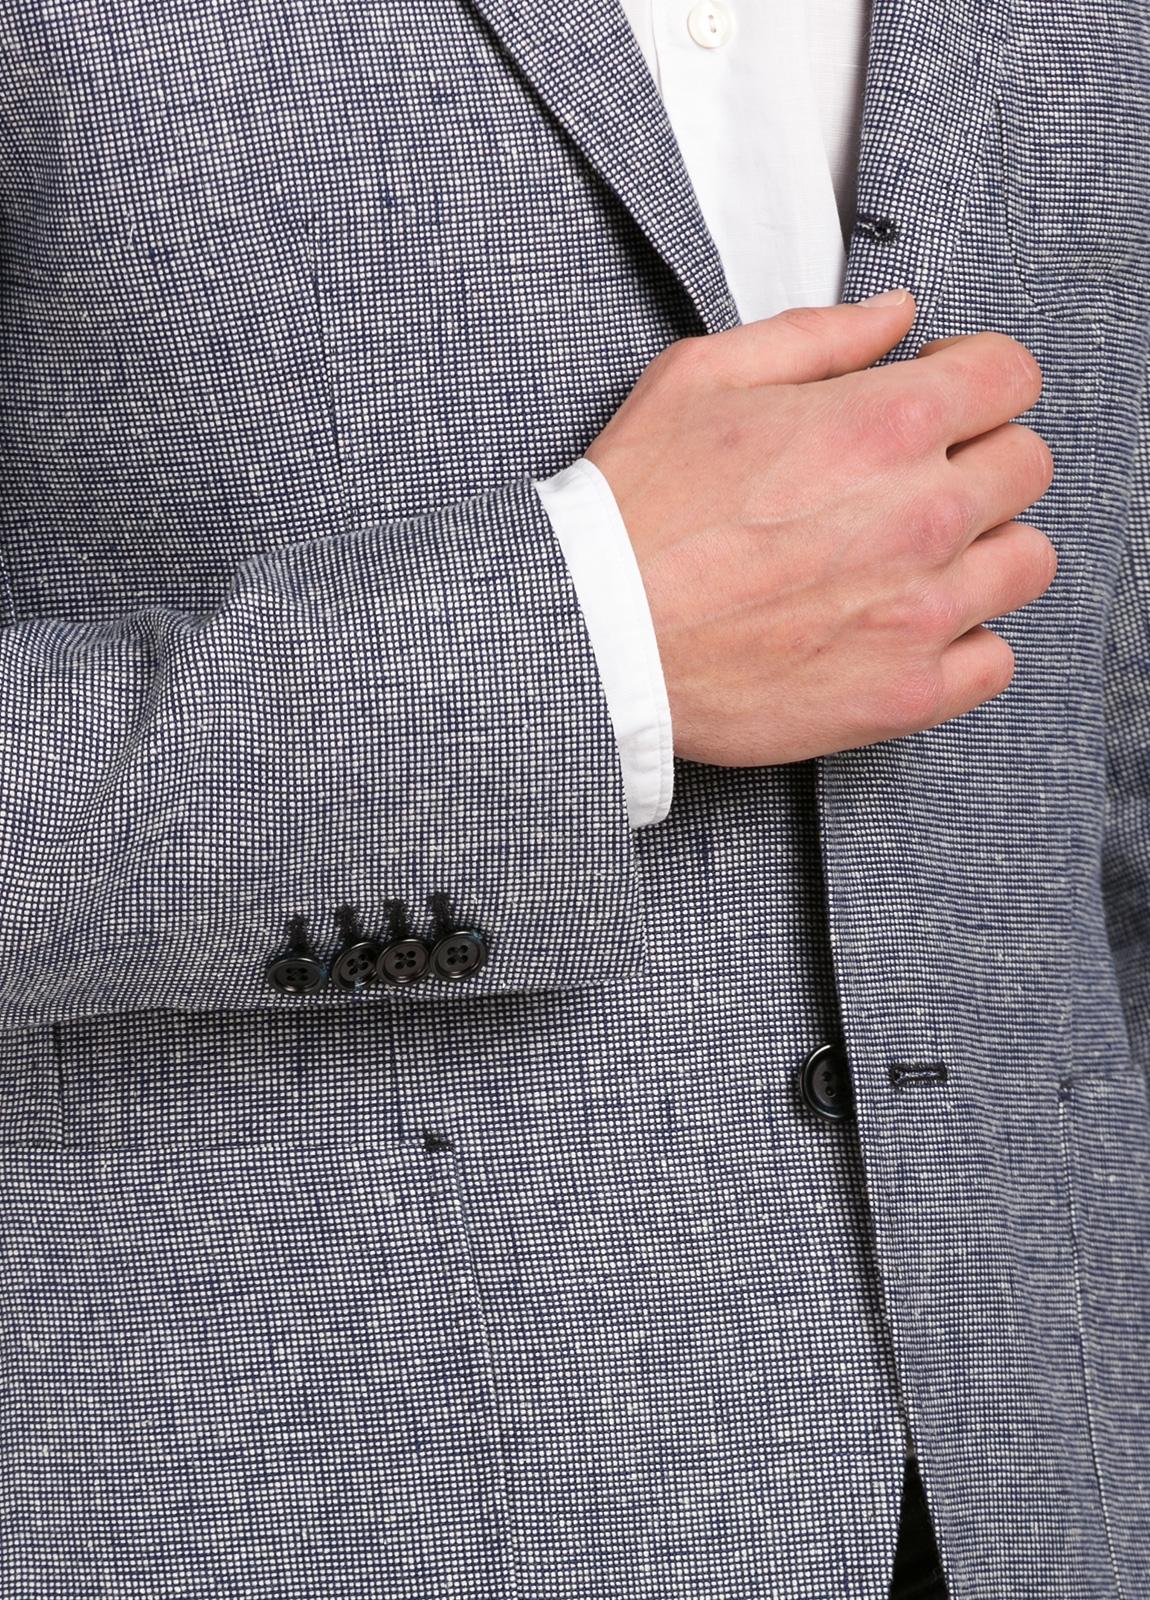 Americana SOFT JACKET Slim Fit diseño textura color azul marino. 60% Lino 18% Lana 12% Seda 10% Algodón. - Ítem3